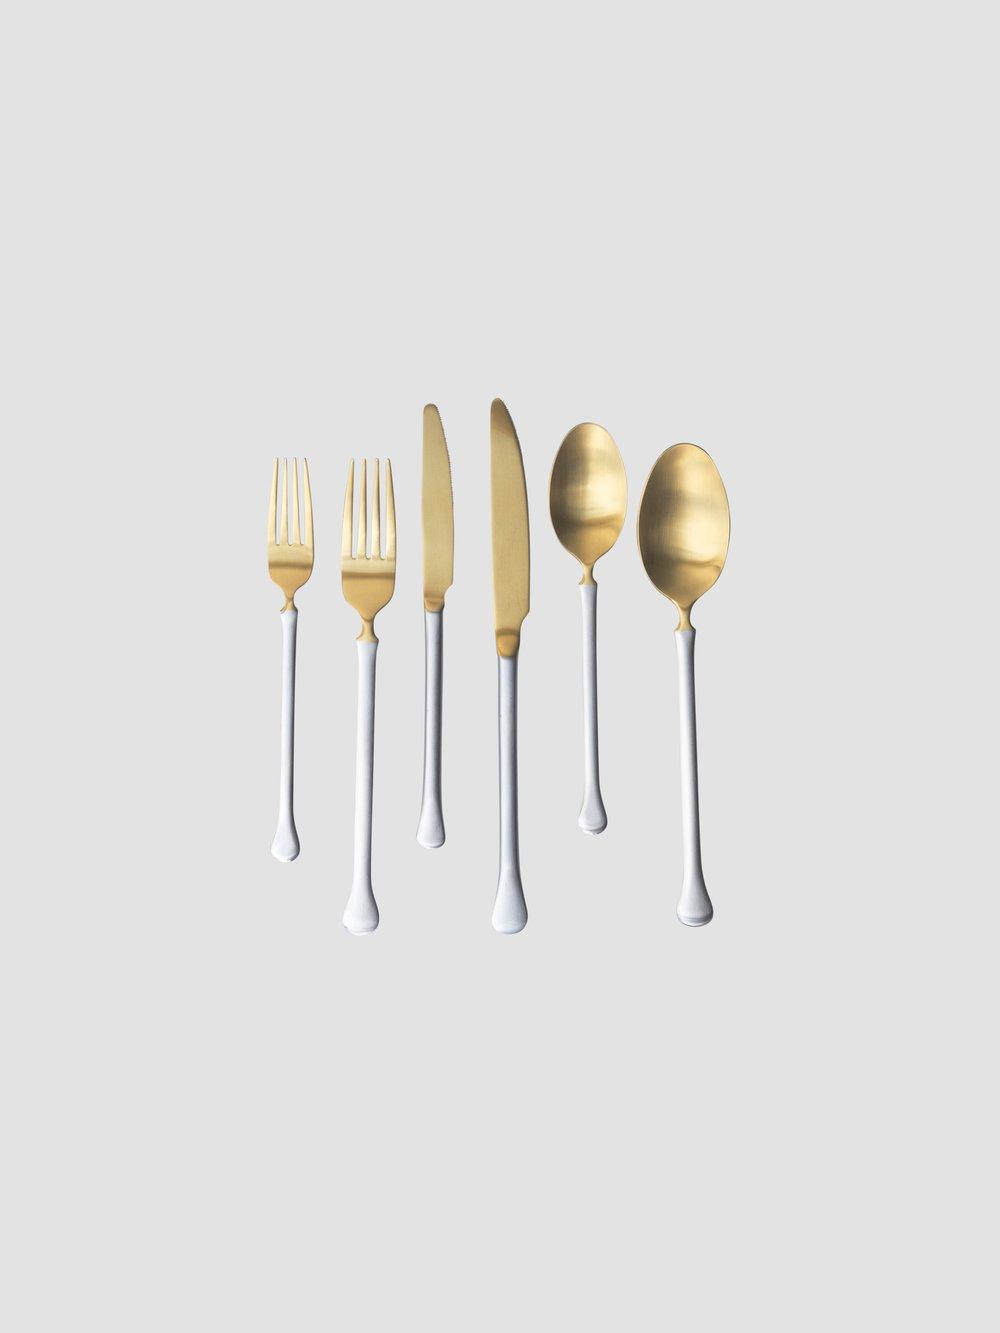 Butter Knife    Salad/Dessert Fork    Dinner Fork    Salad/Dessert Knife    Dinner Knife    Teaspoon    Dinner Spoon